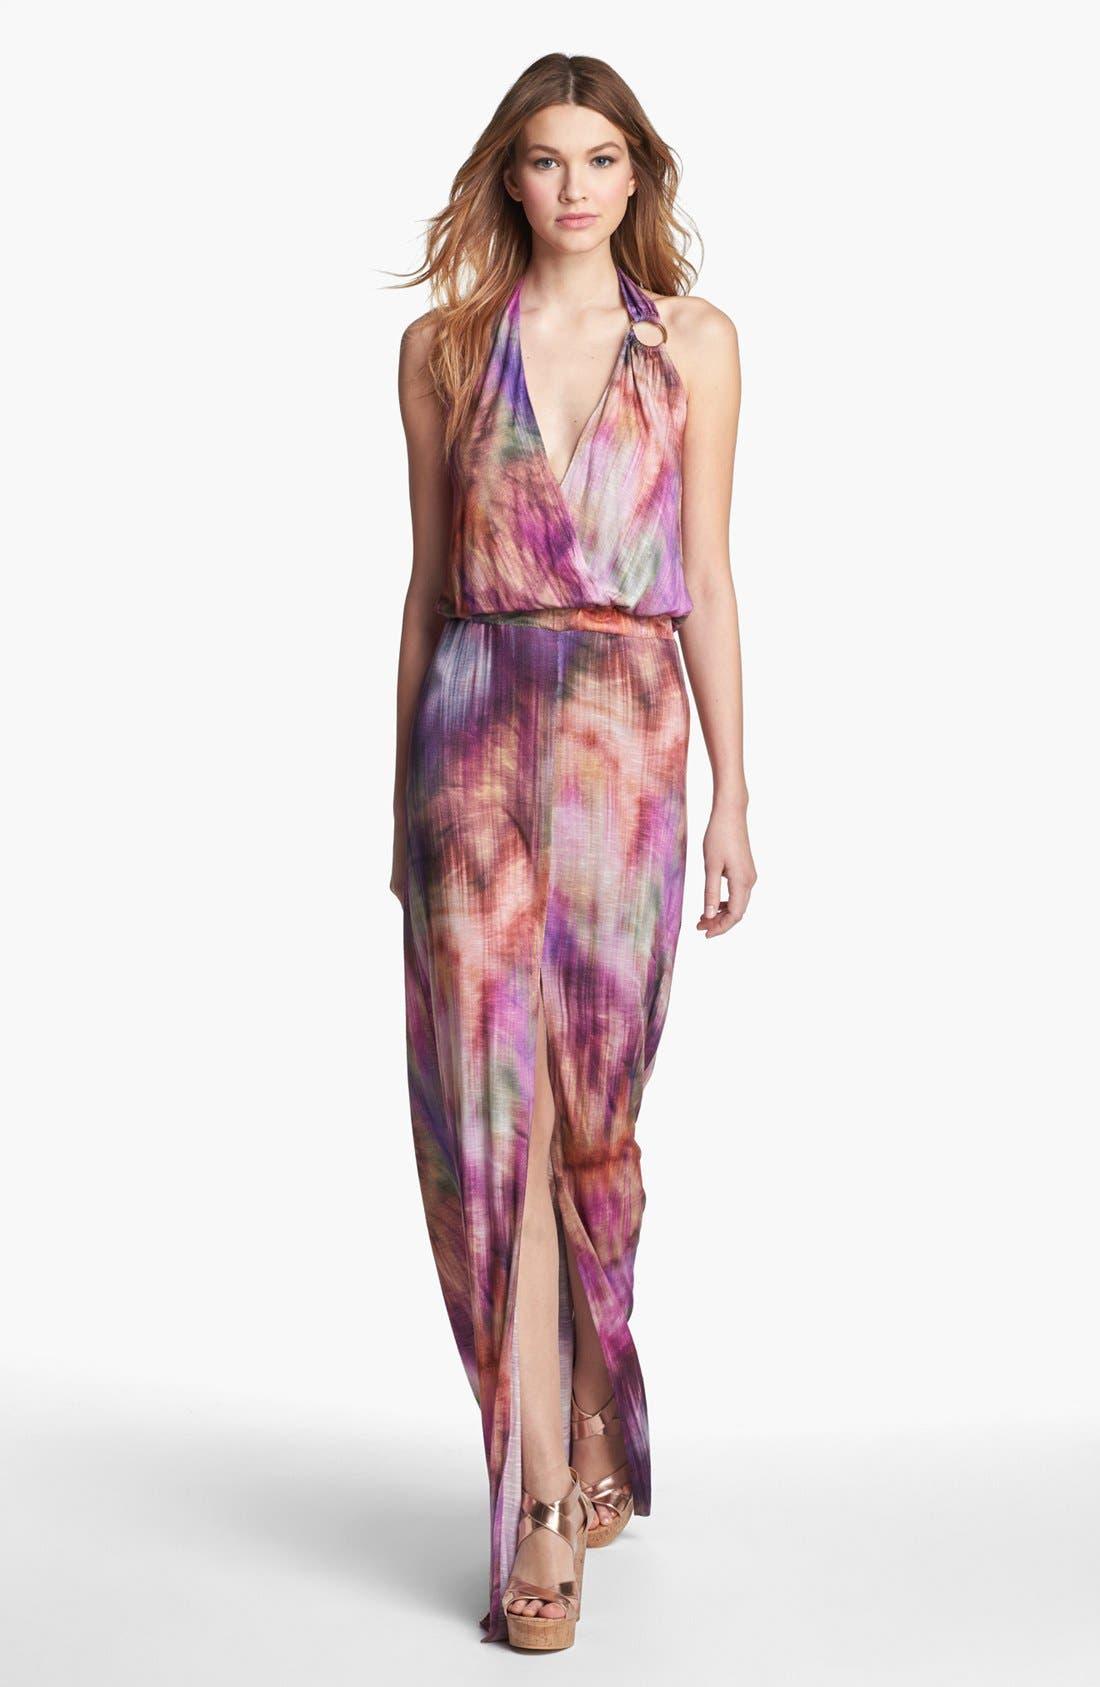 Alternate Image 1 Selected - Young, Fabulous & Broke 'Garnet' Maxi Dress